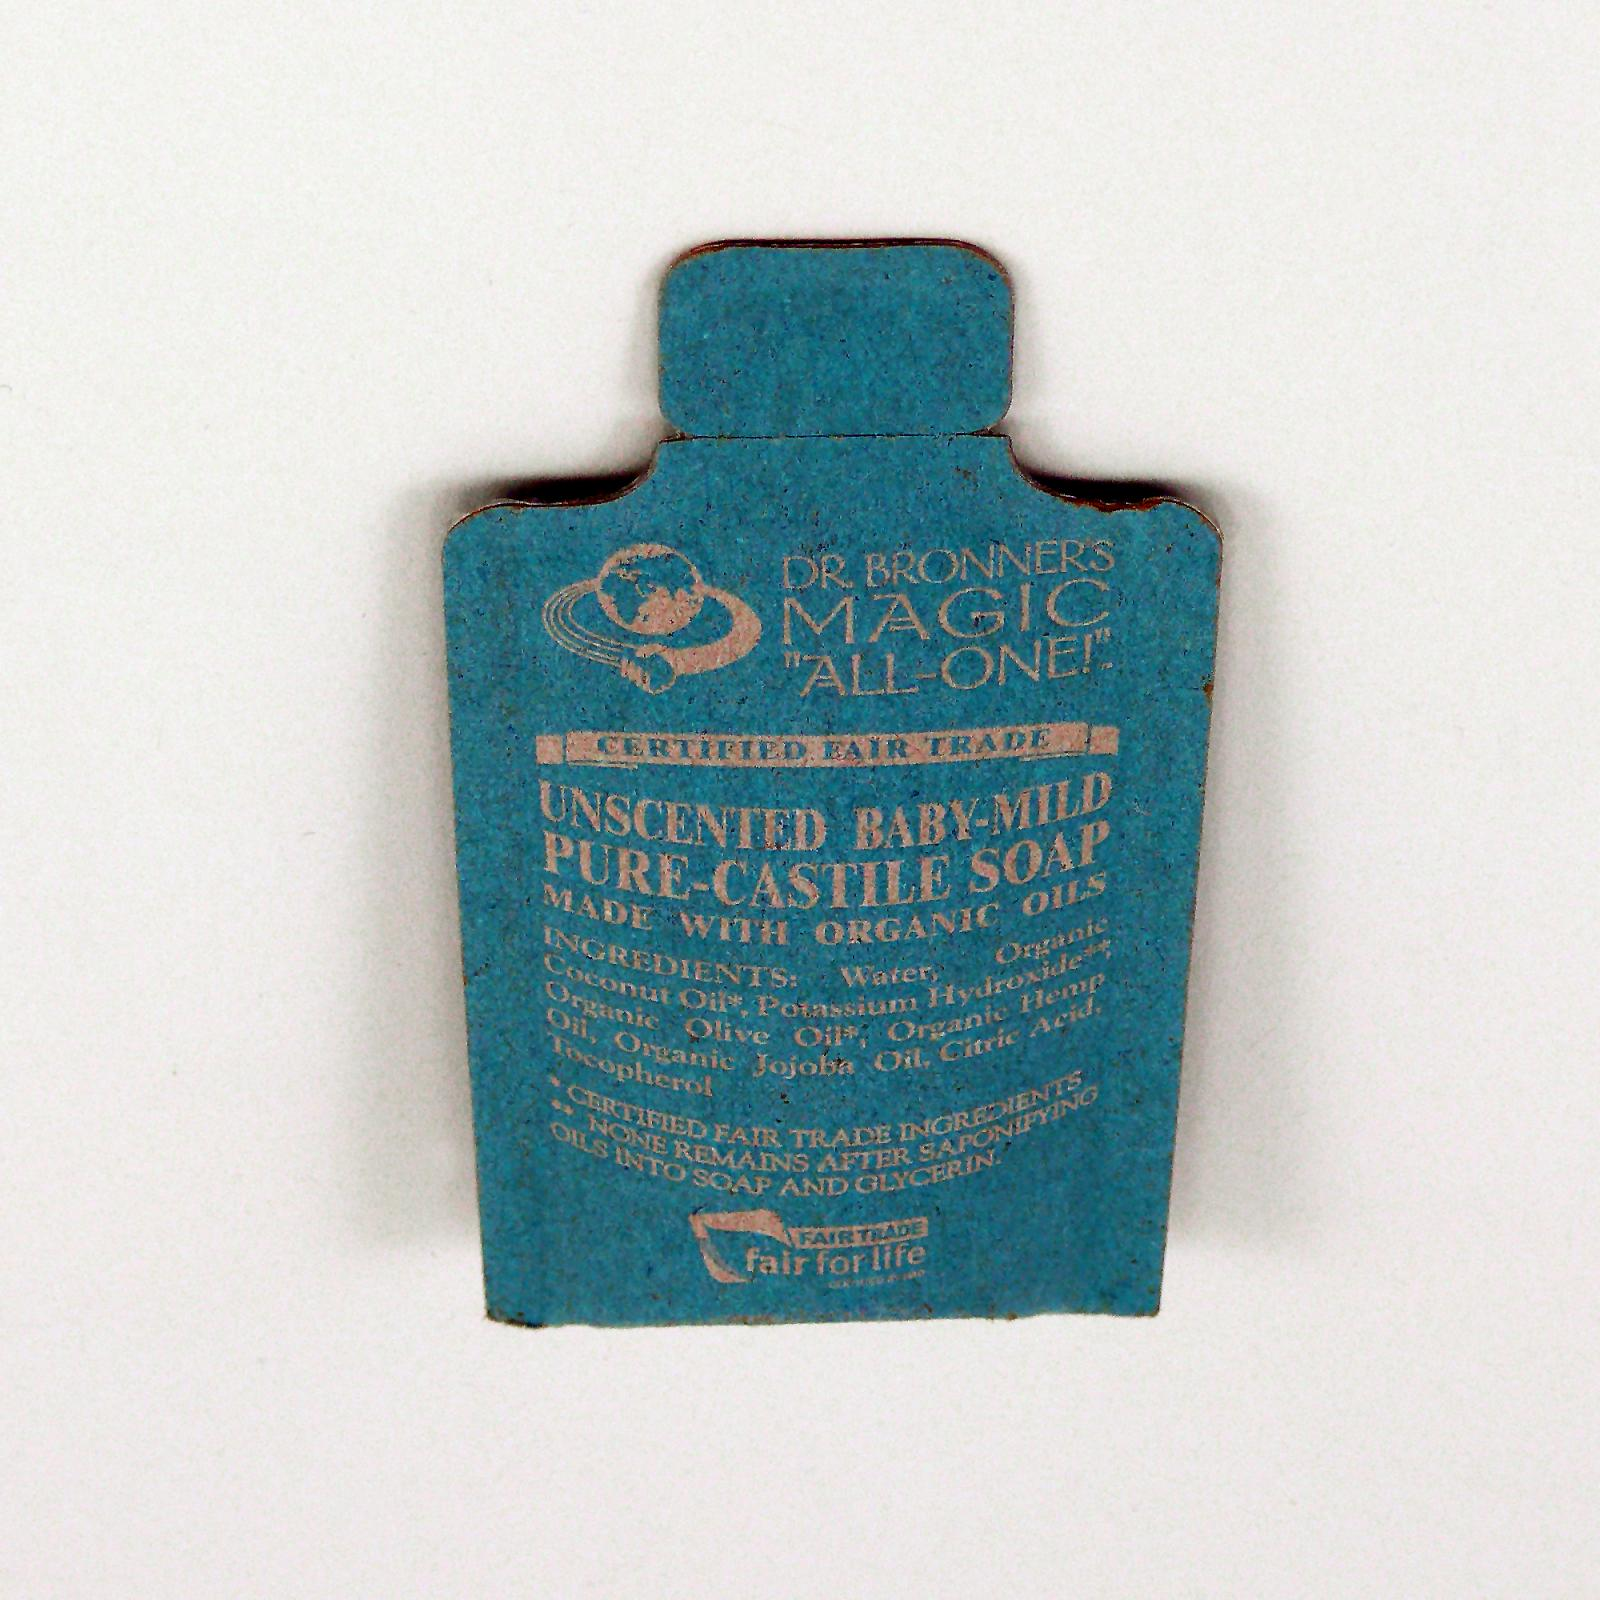 Dr. Bronner´s Tekuté universální mýdlo ALL-ONE!, Baby-Mild 10 ml